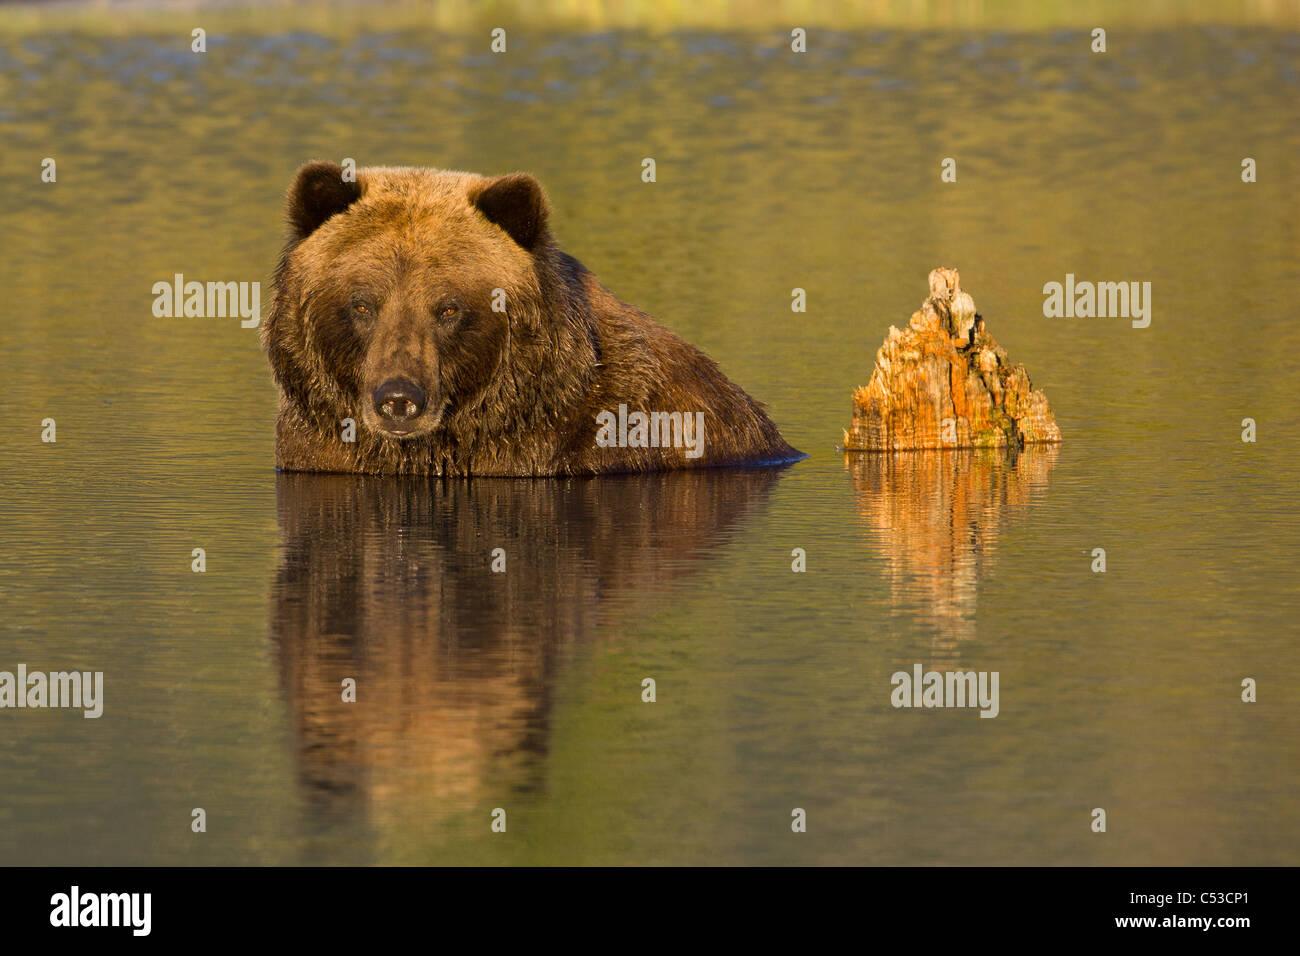 Una hembra de oso pardo mayormente sumergido en agua en Alaska Wildlife Conservation Center, Southcentral Alaska, Imagen De Stock